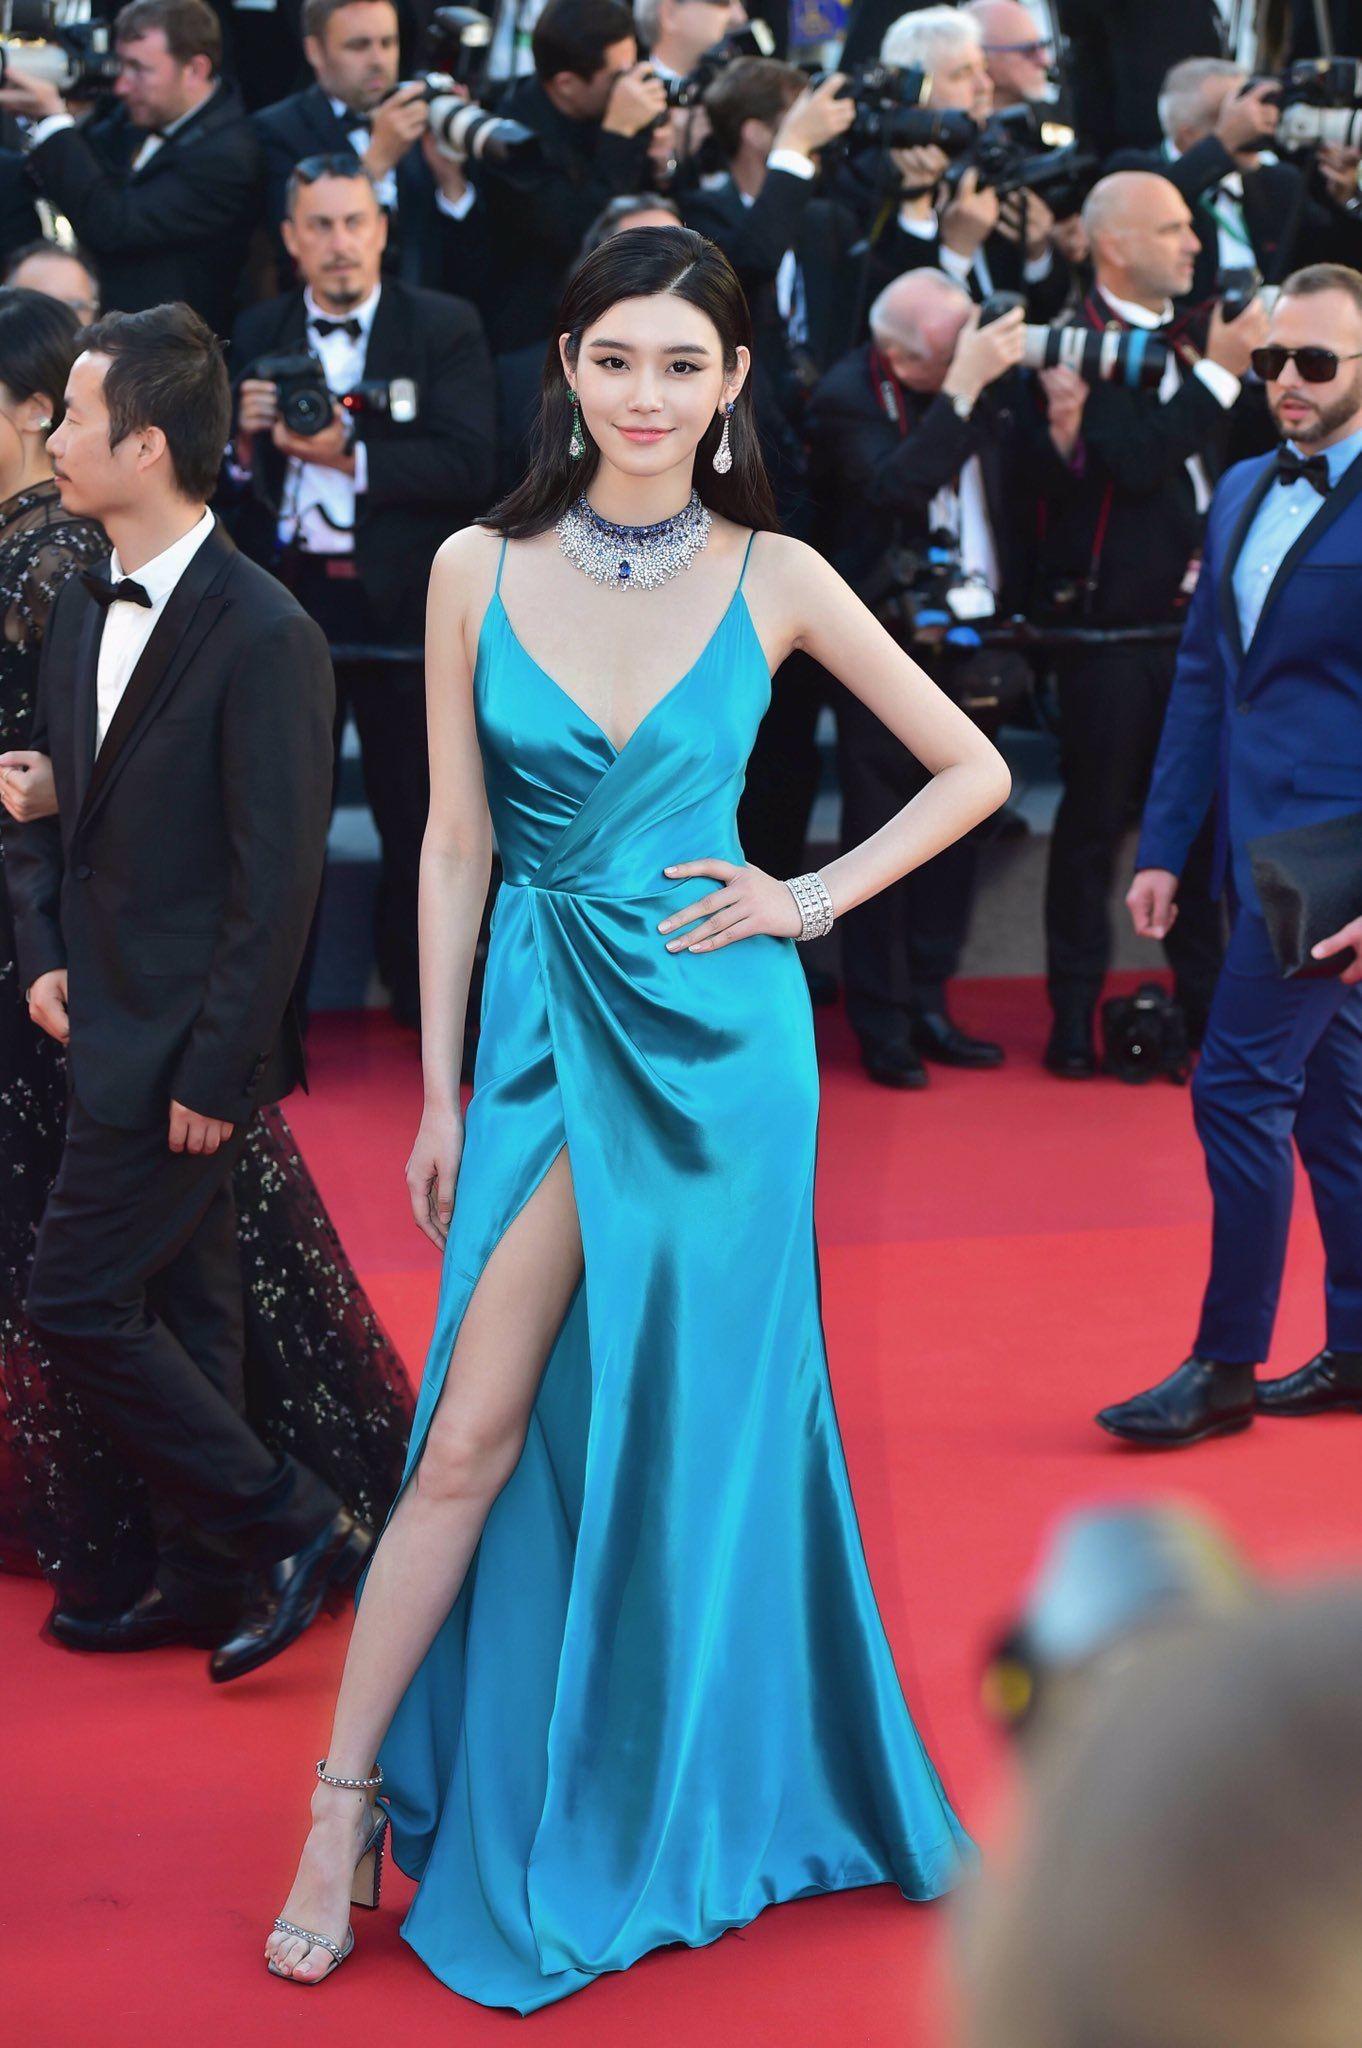 Ming xi 2017   Chinese actress   Pinterest   Victoria secret ...